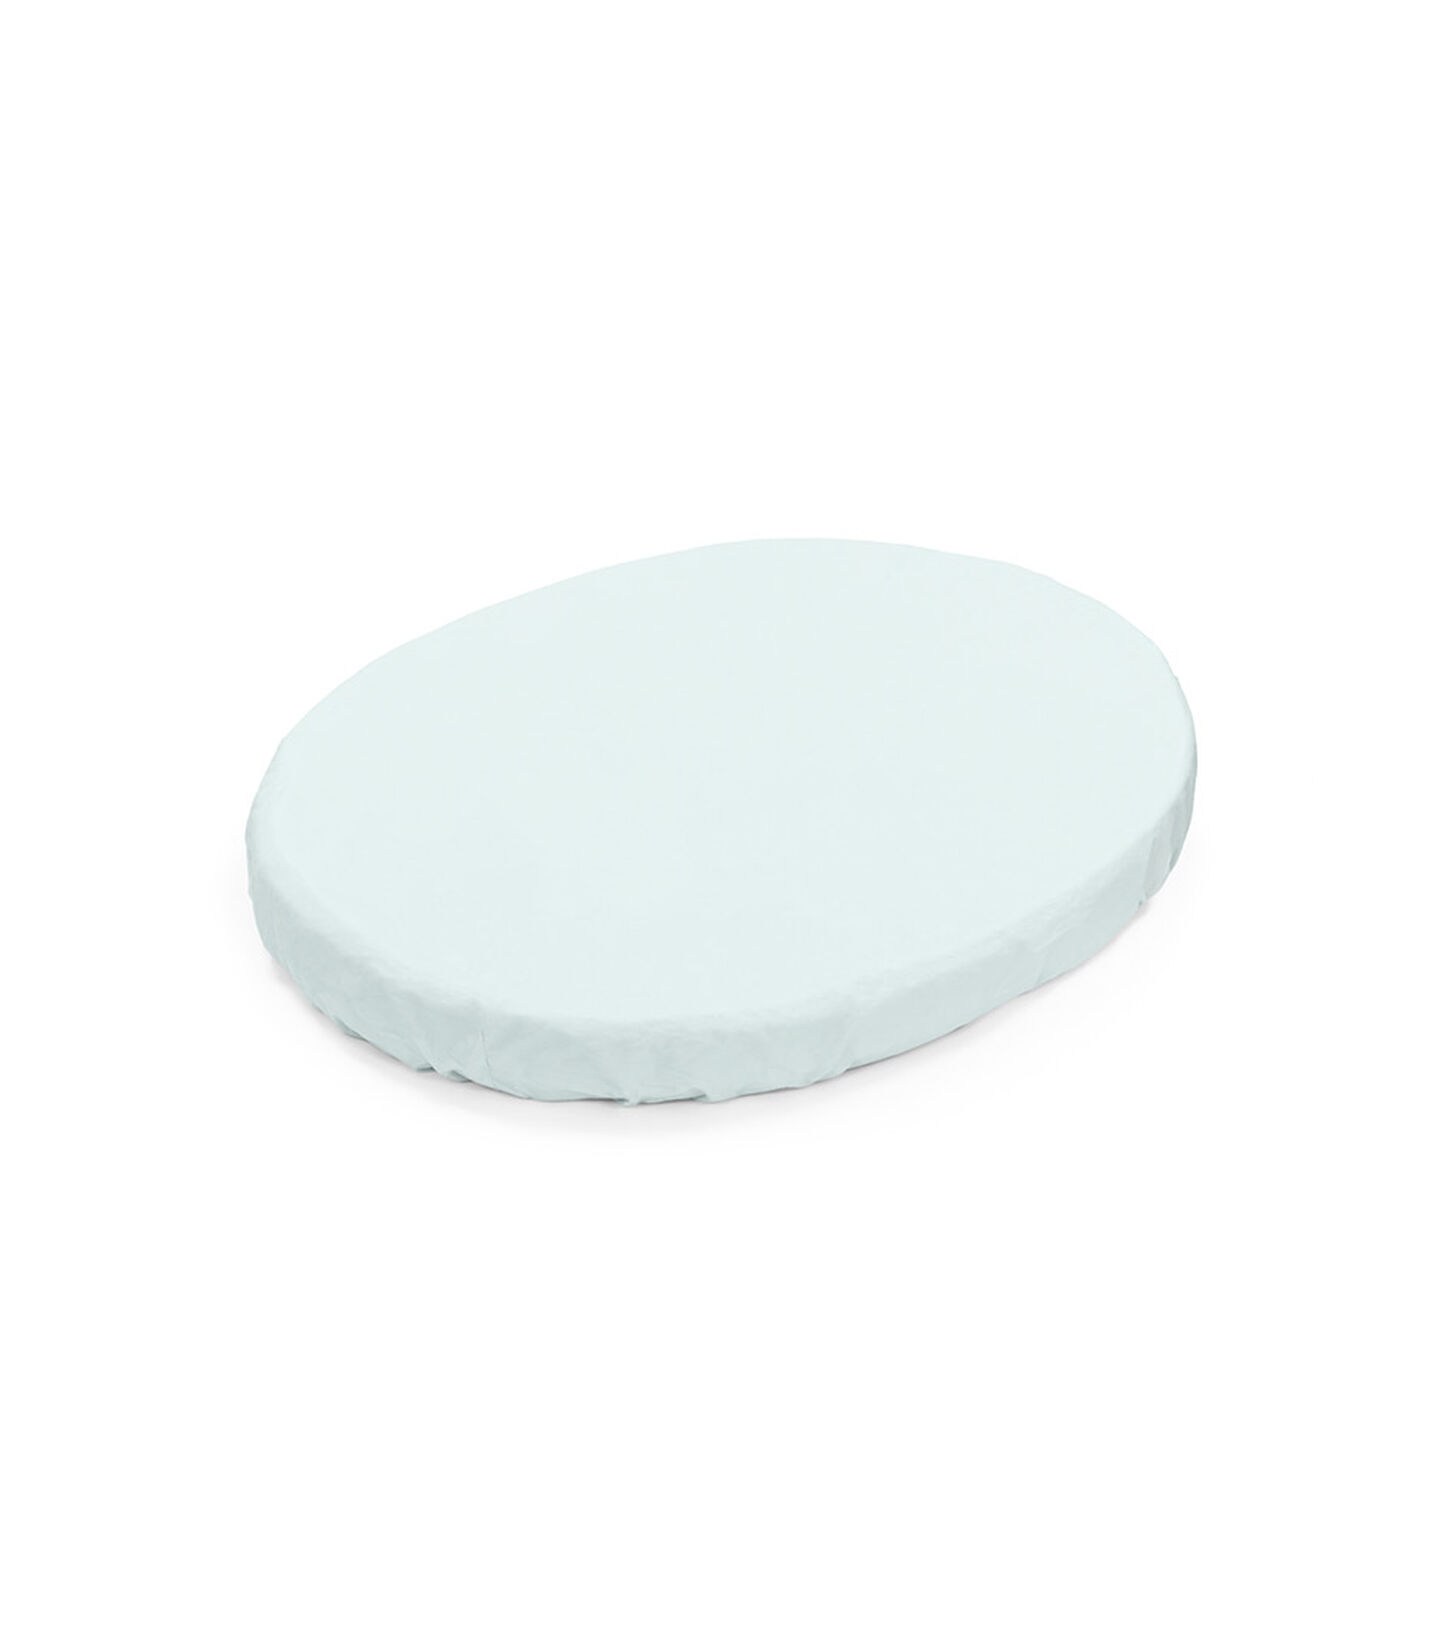 Lenzuolo con angoli Powder Blue Stokke® Sleepi™ Mini, Powder Blue, mainview view 2